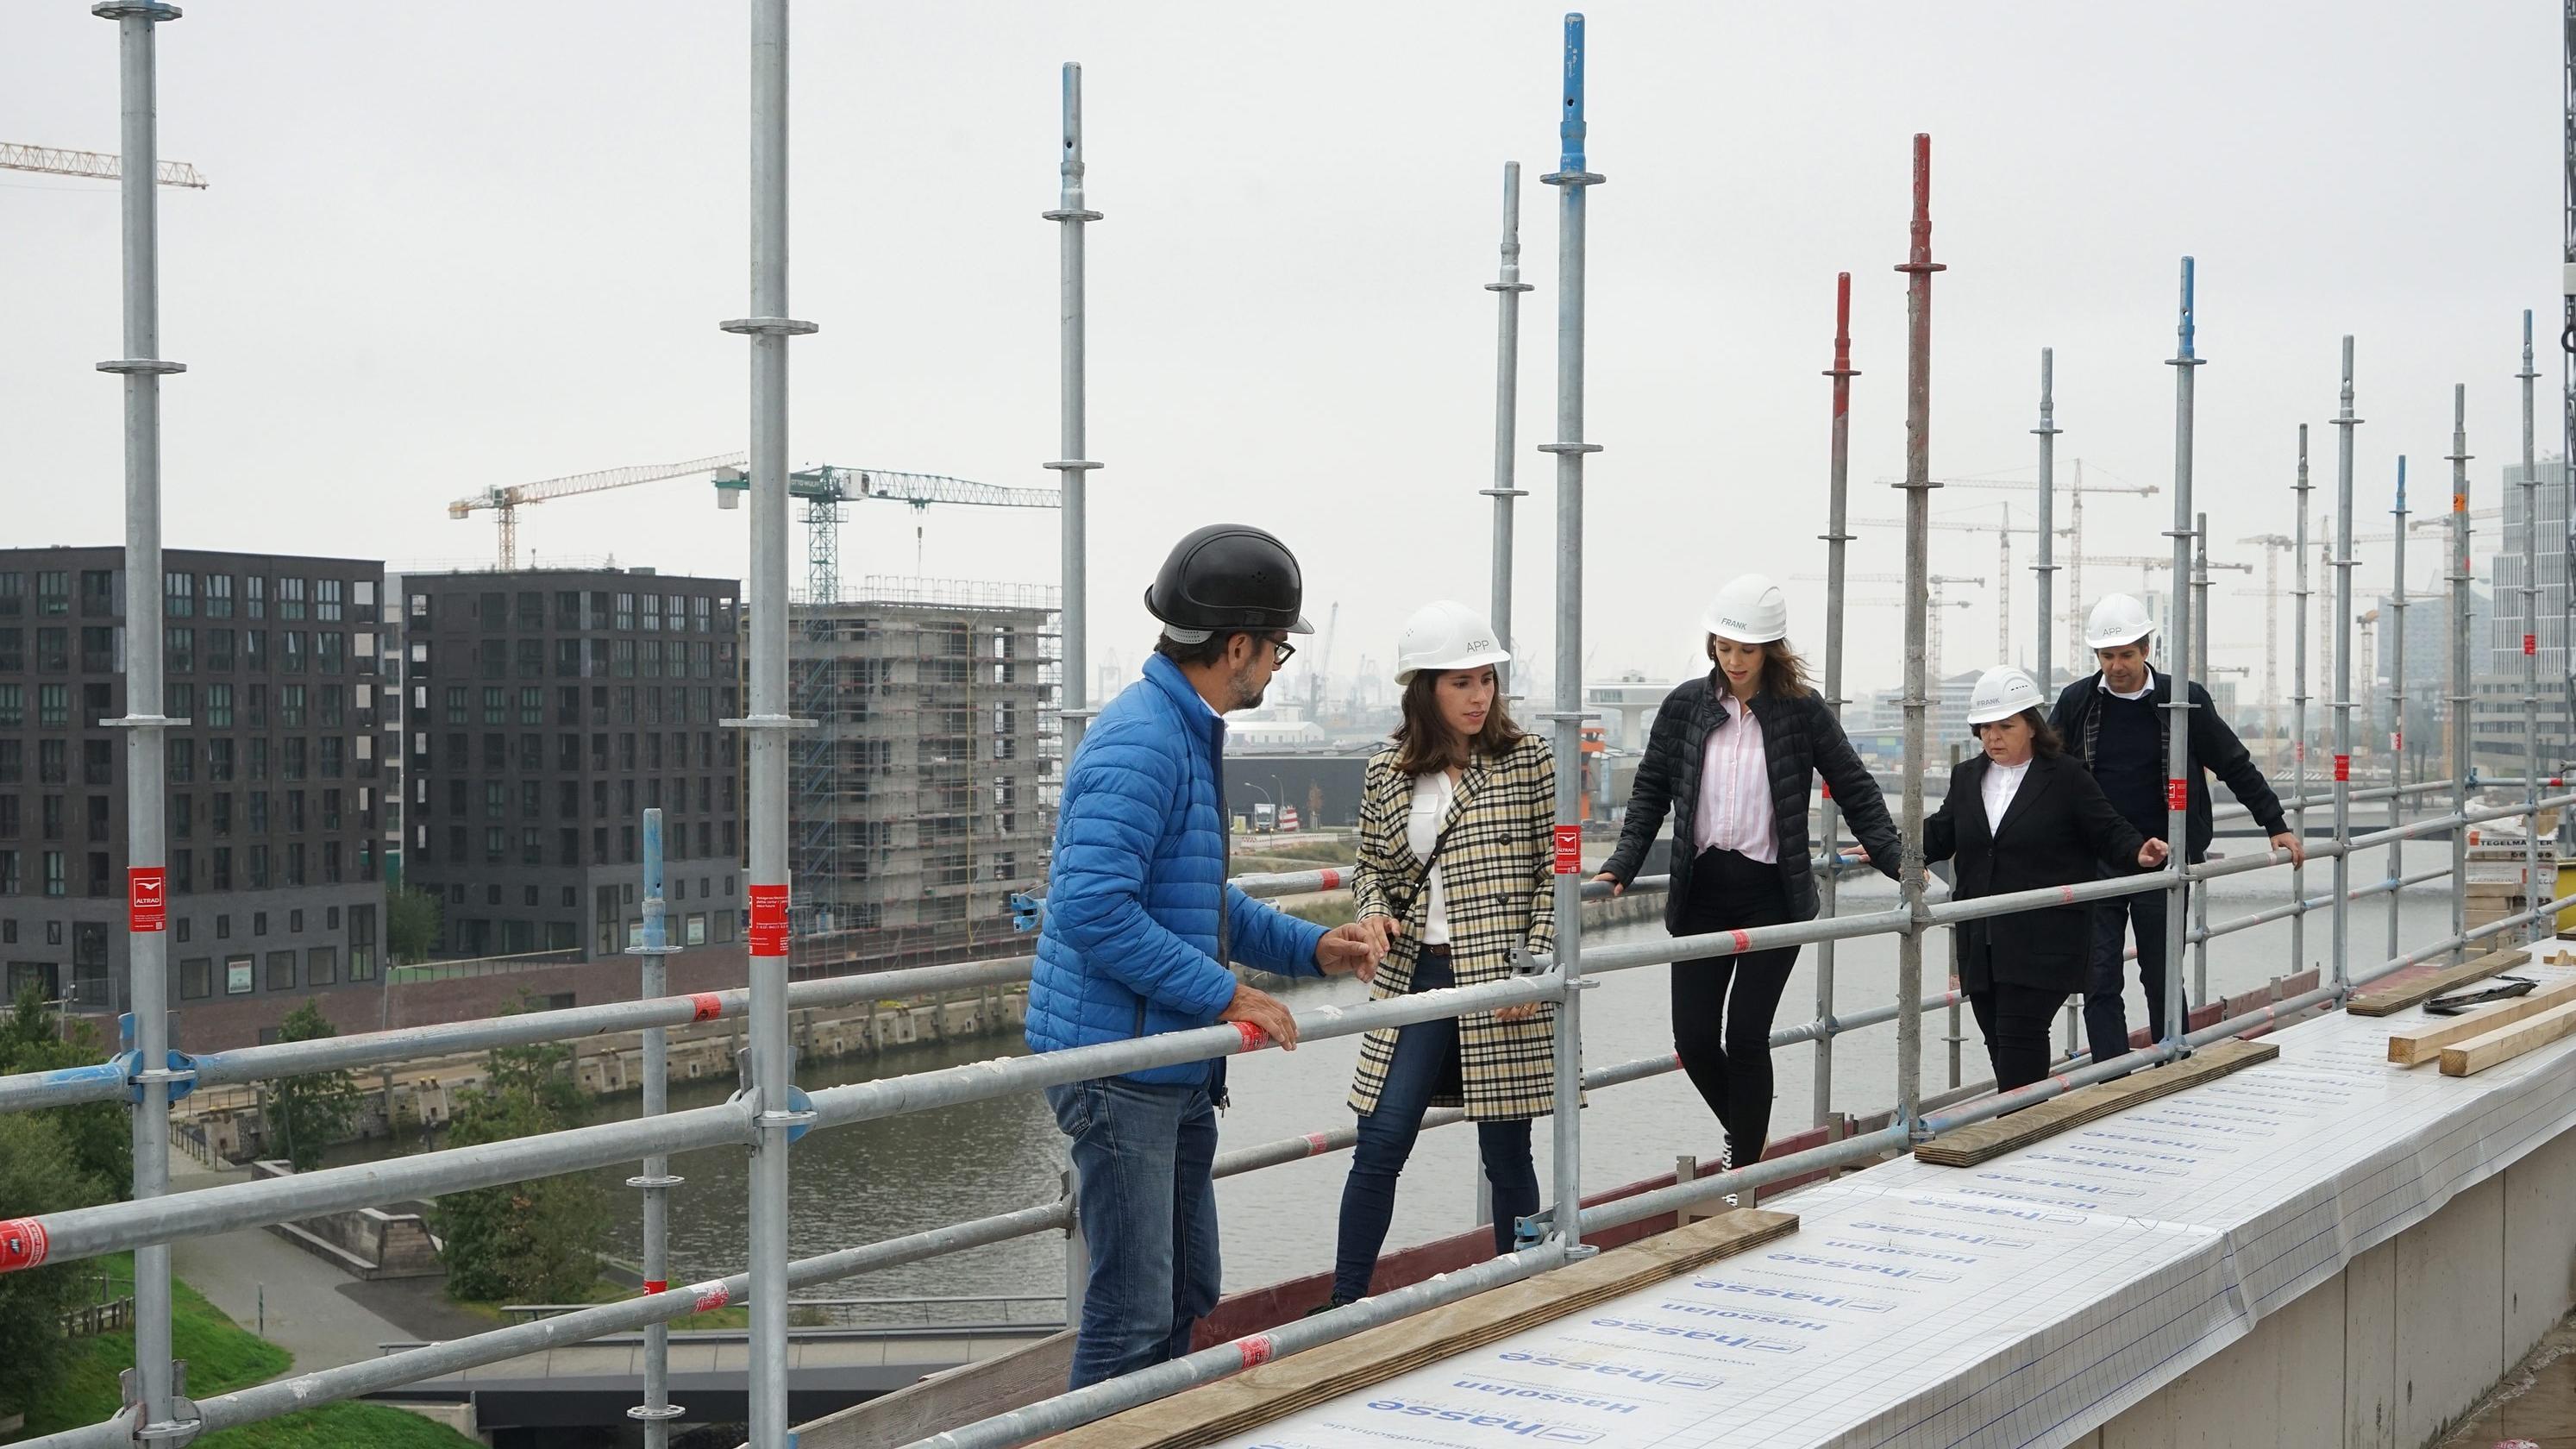 Development Baakenhafen HafenCity Ankerplatz